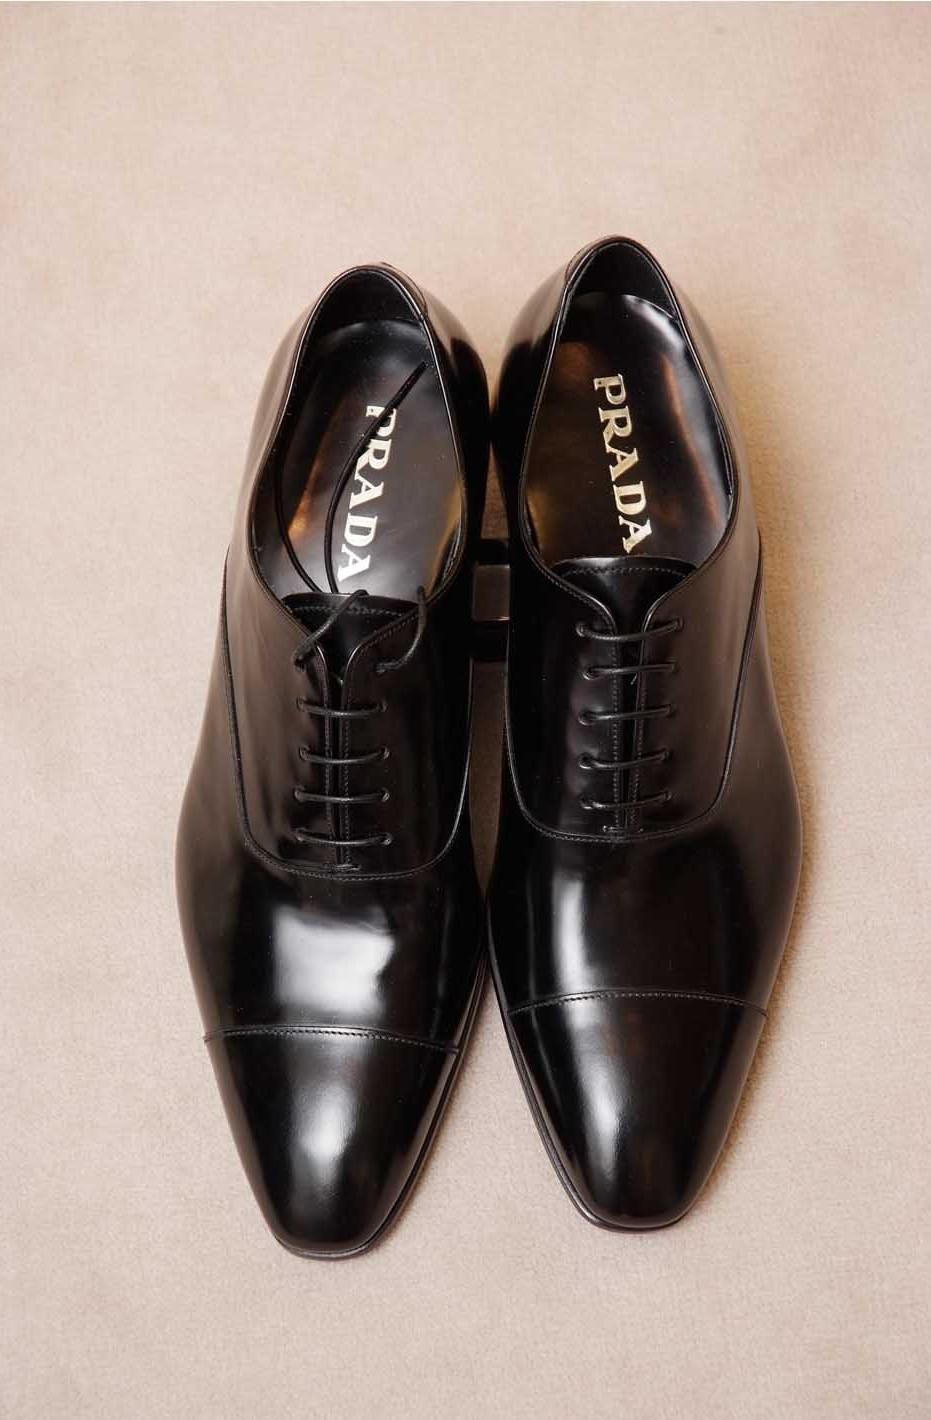 930733cfa Zapatos Prada cordones – CharmeBlog